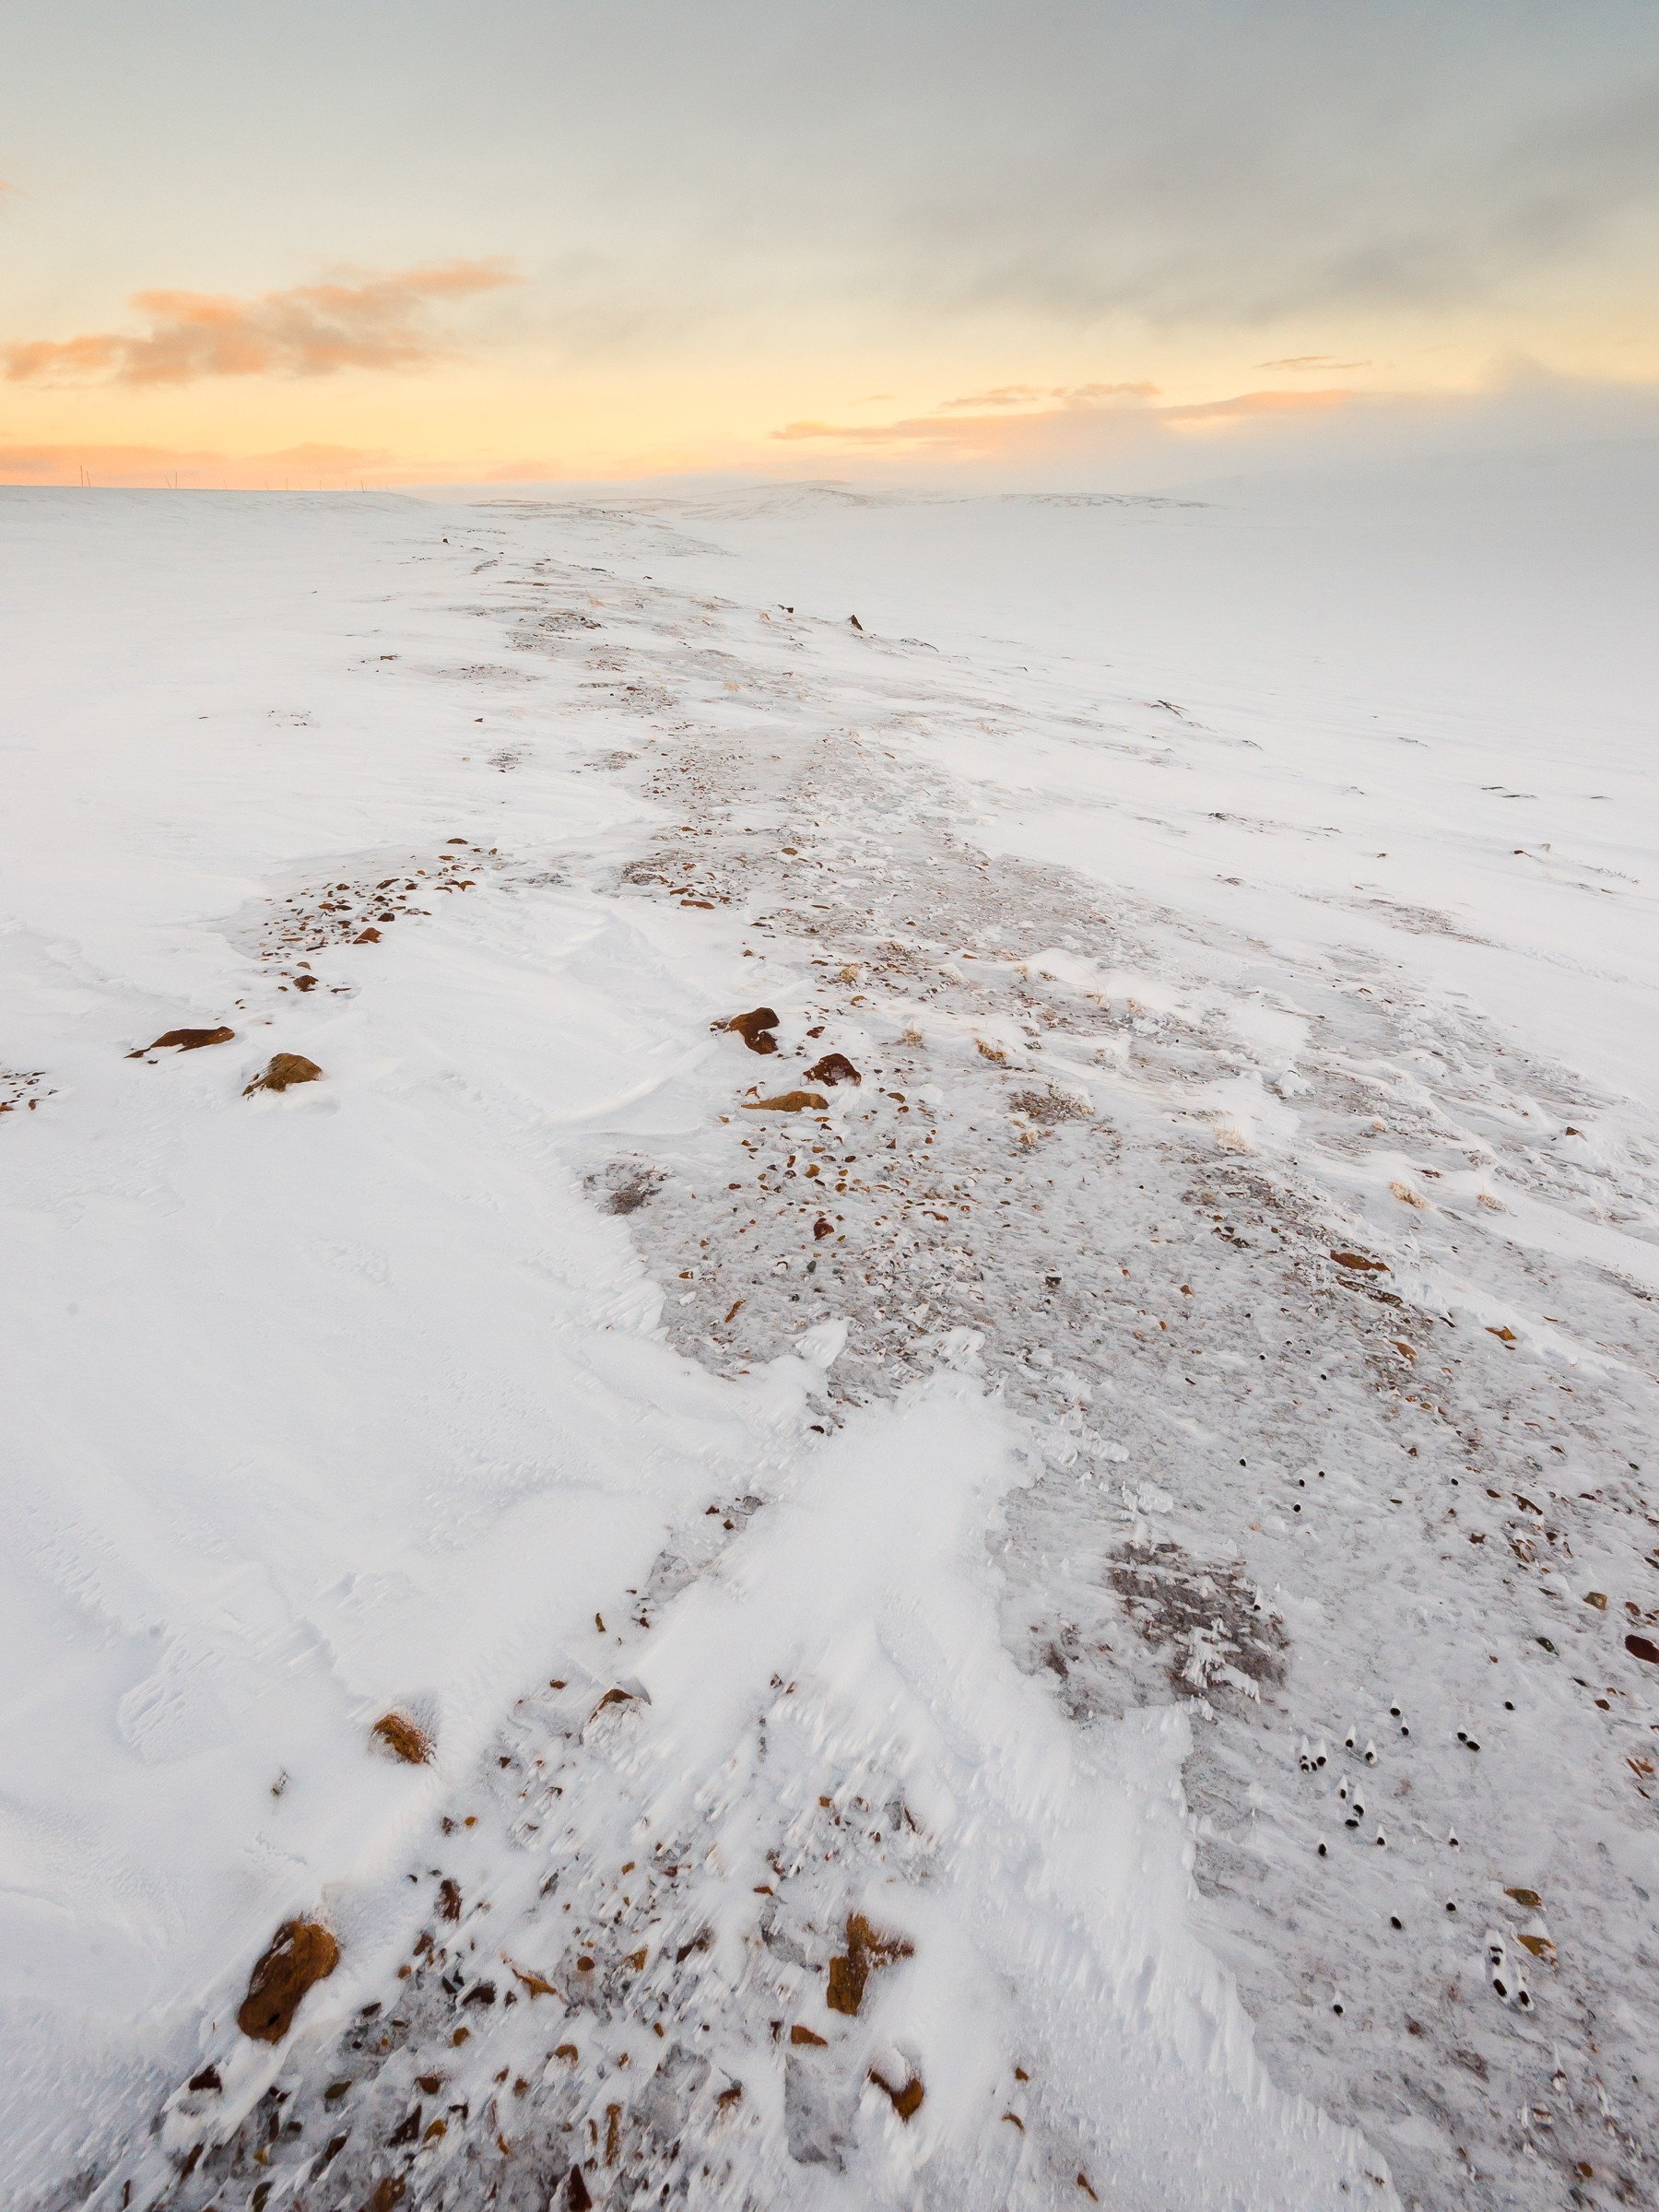 20150305-winters lapland_ND48643-bewerkt.jpg